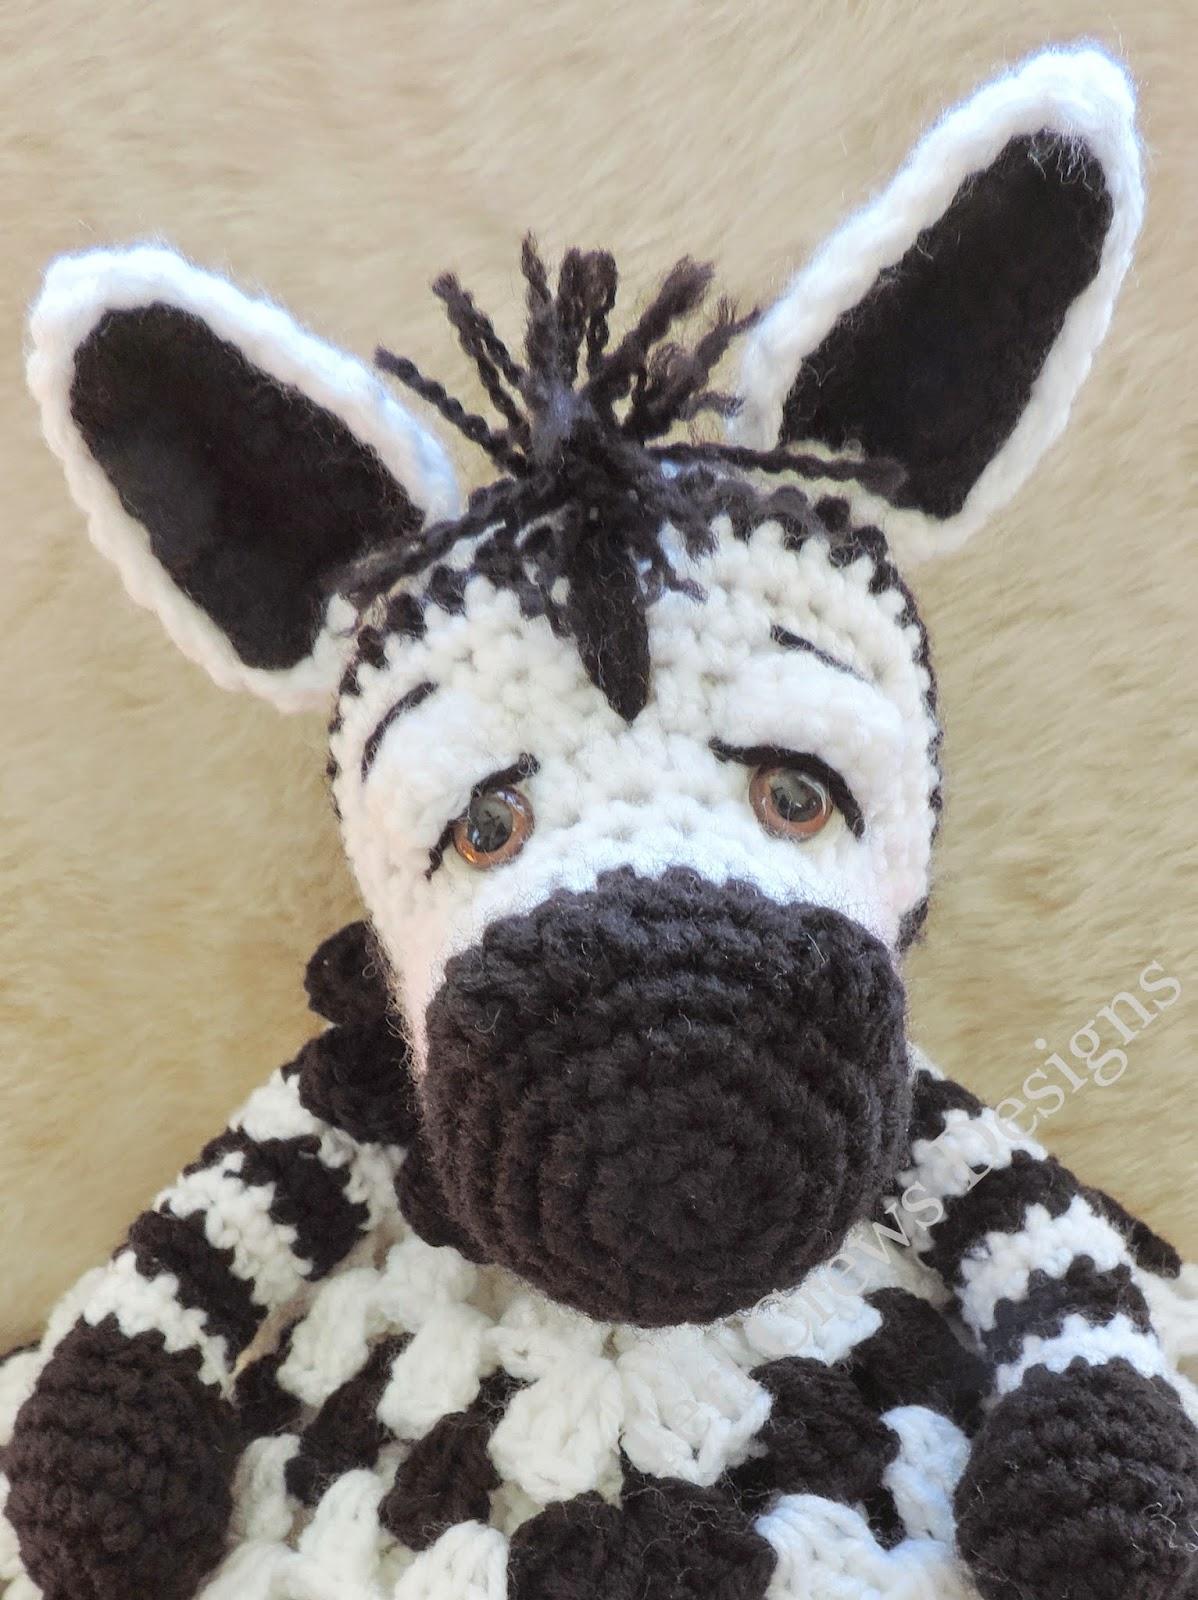 Teri's Blog: Seeing Stripes, New Zebra Patterns